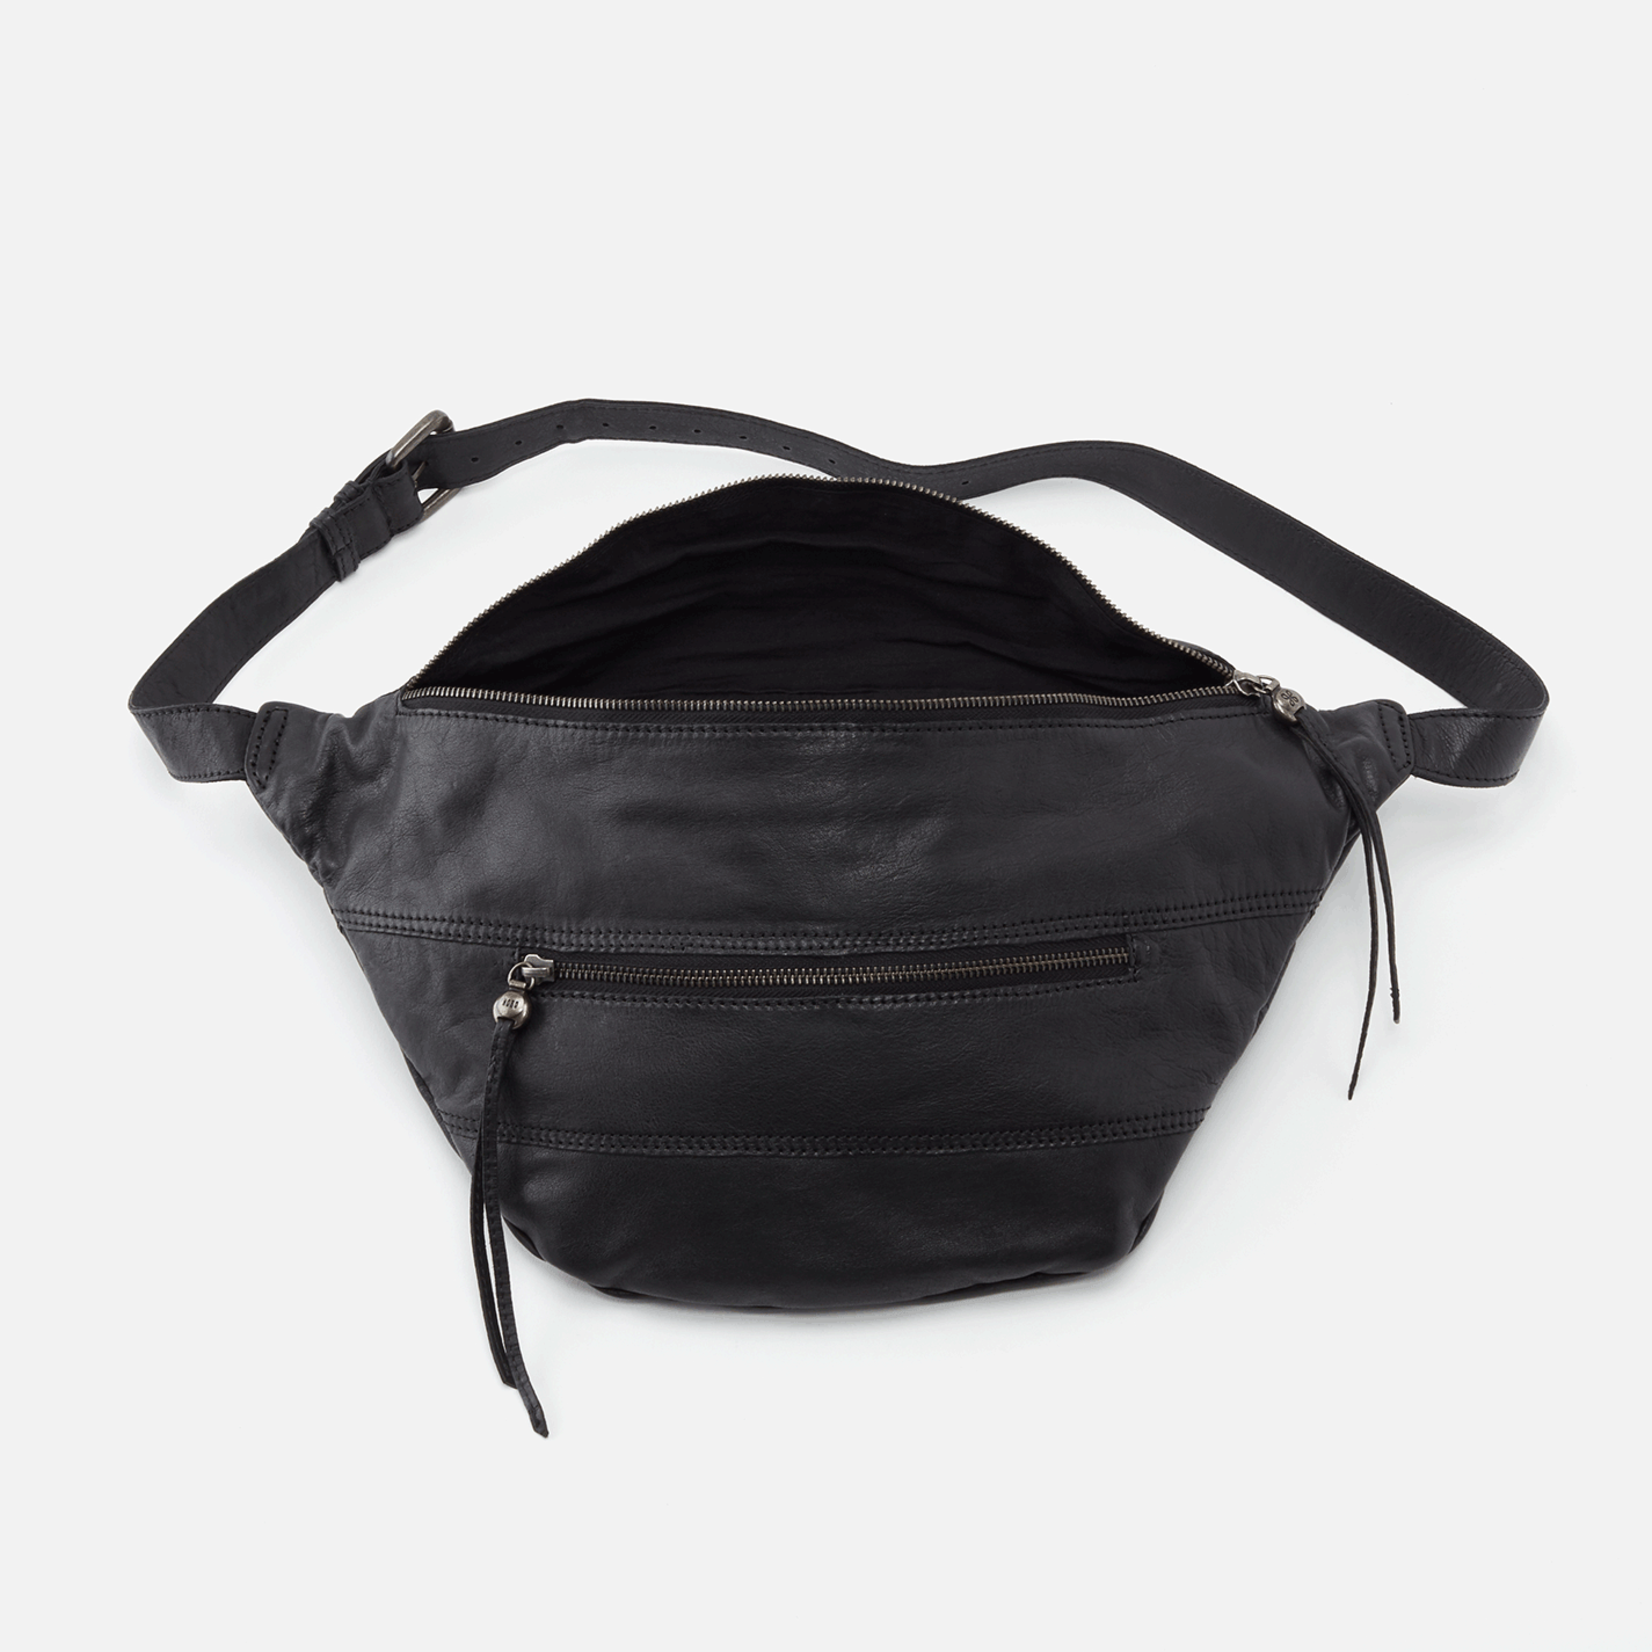 HOBO Roadster Belt Bag Sling in Black